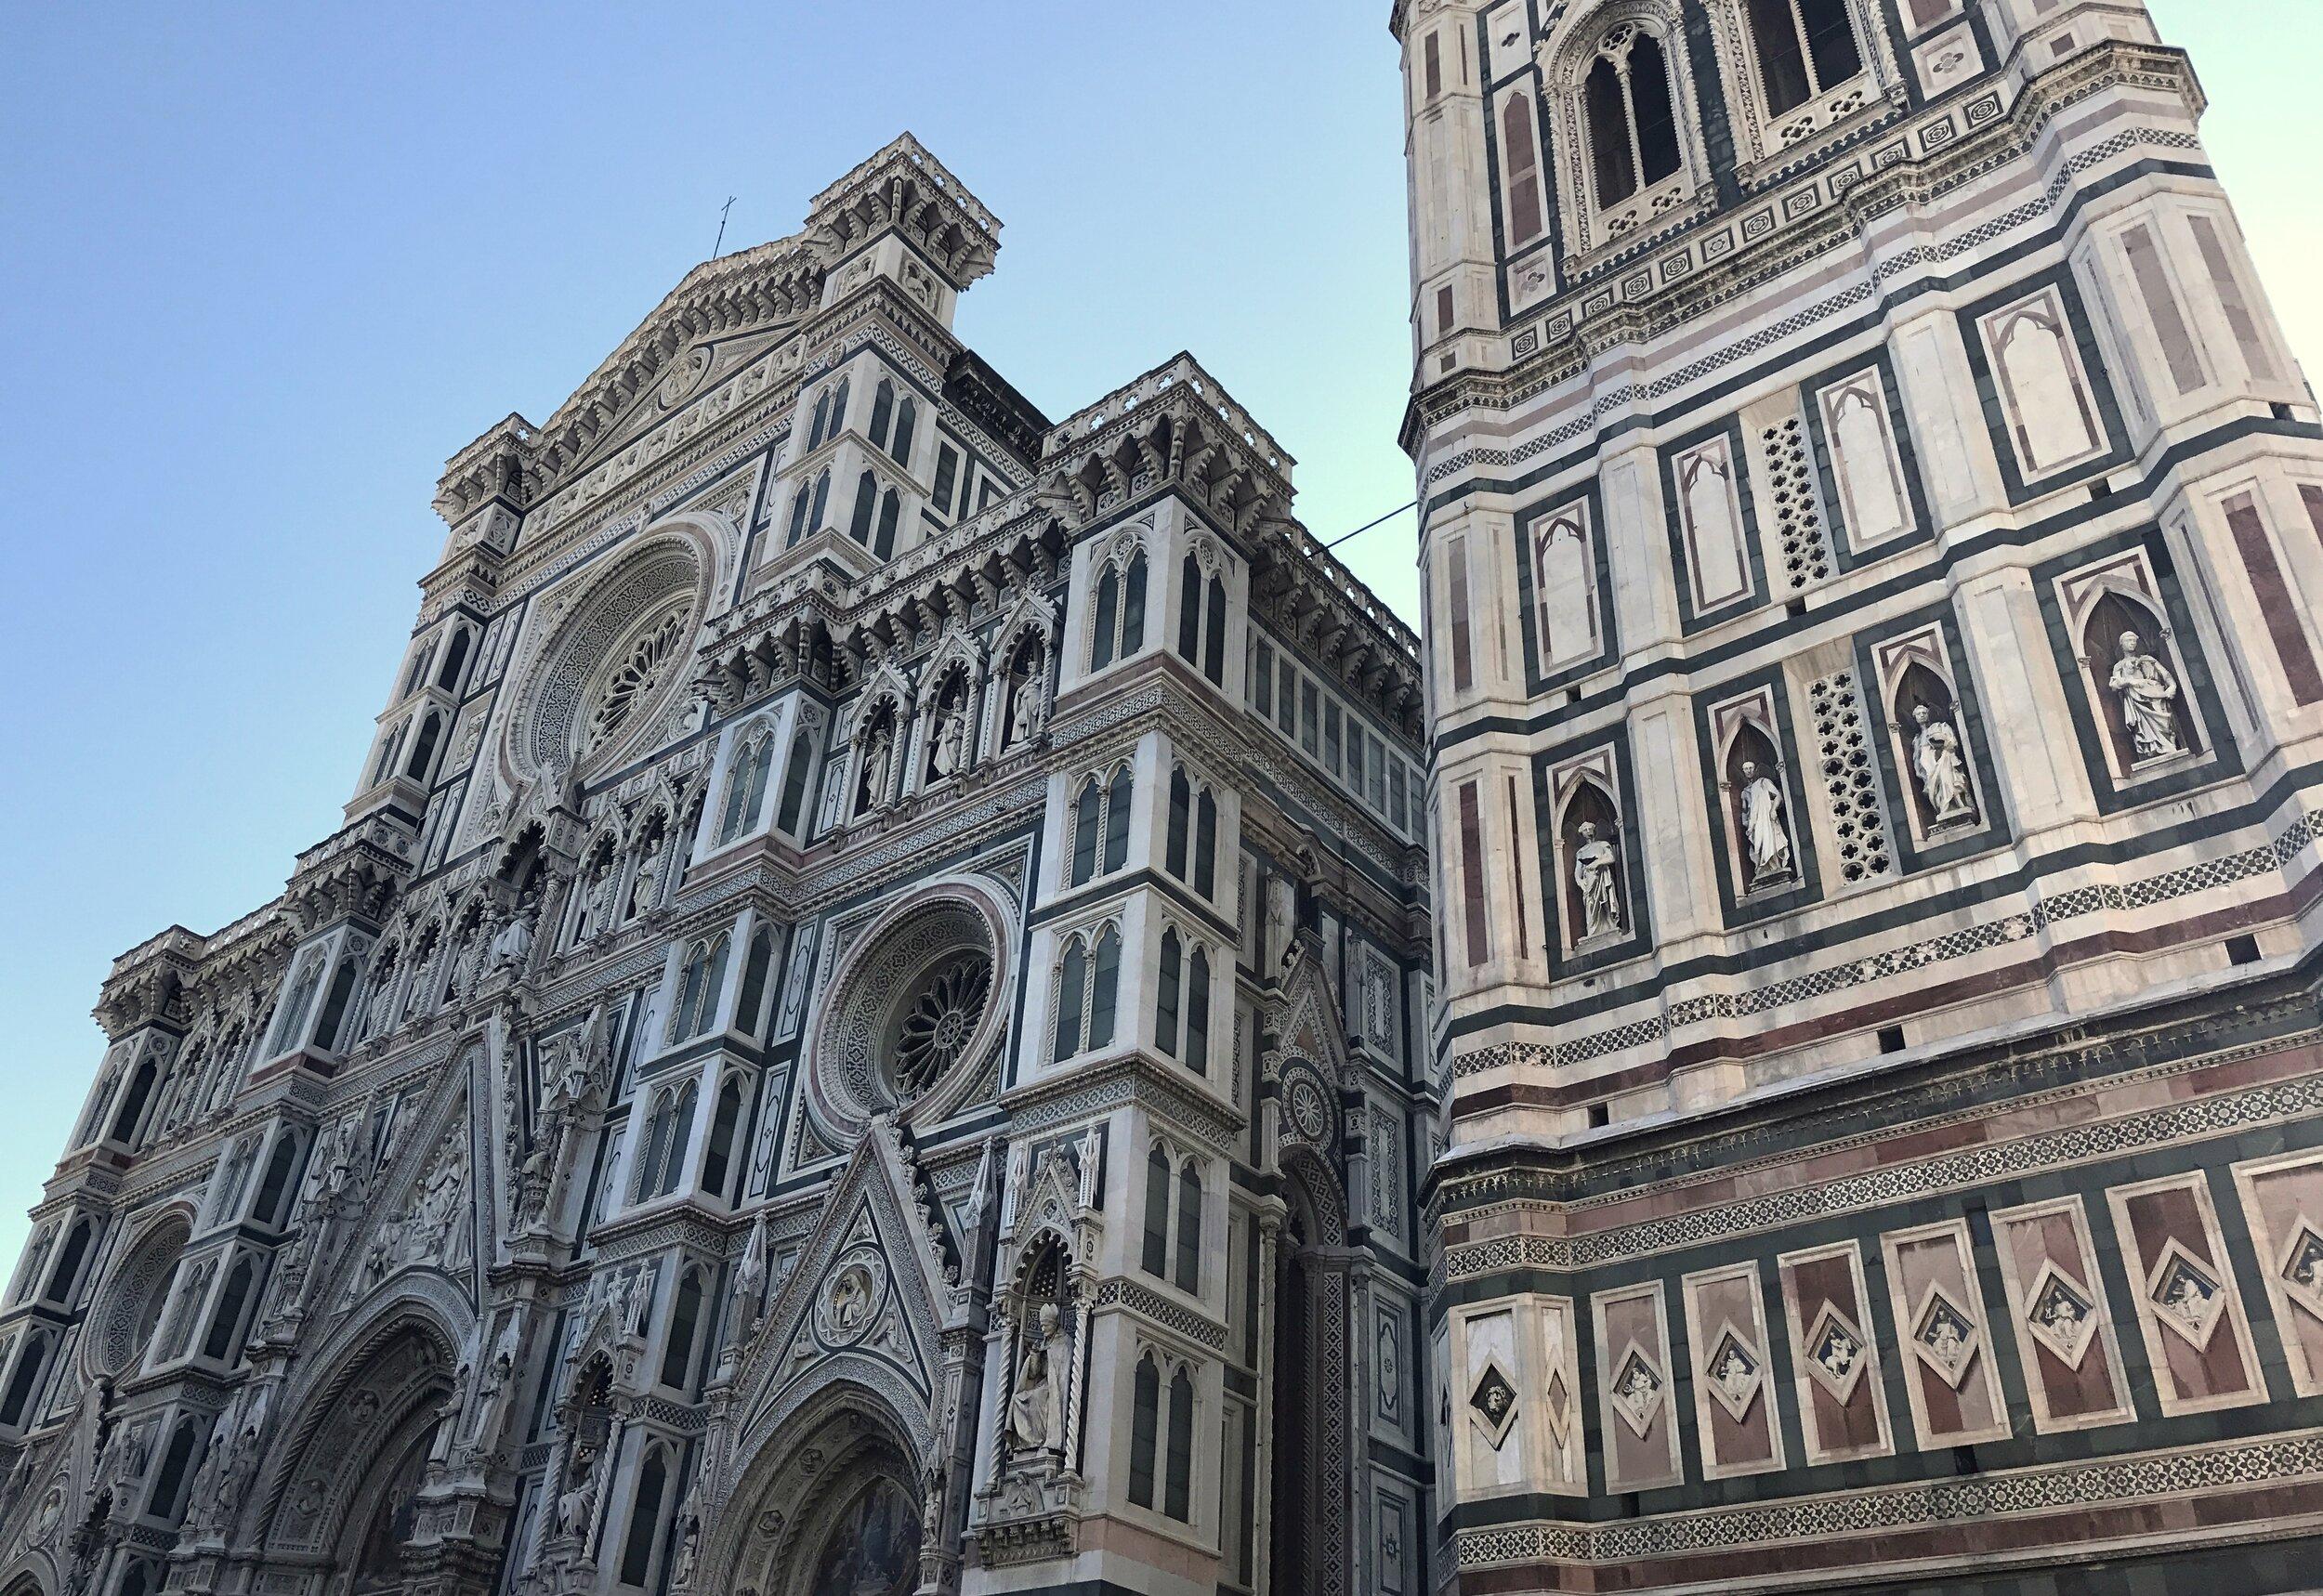 Firenze Duomo, Firenze